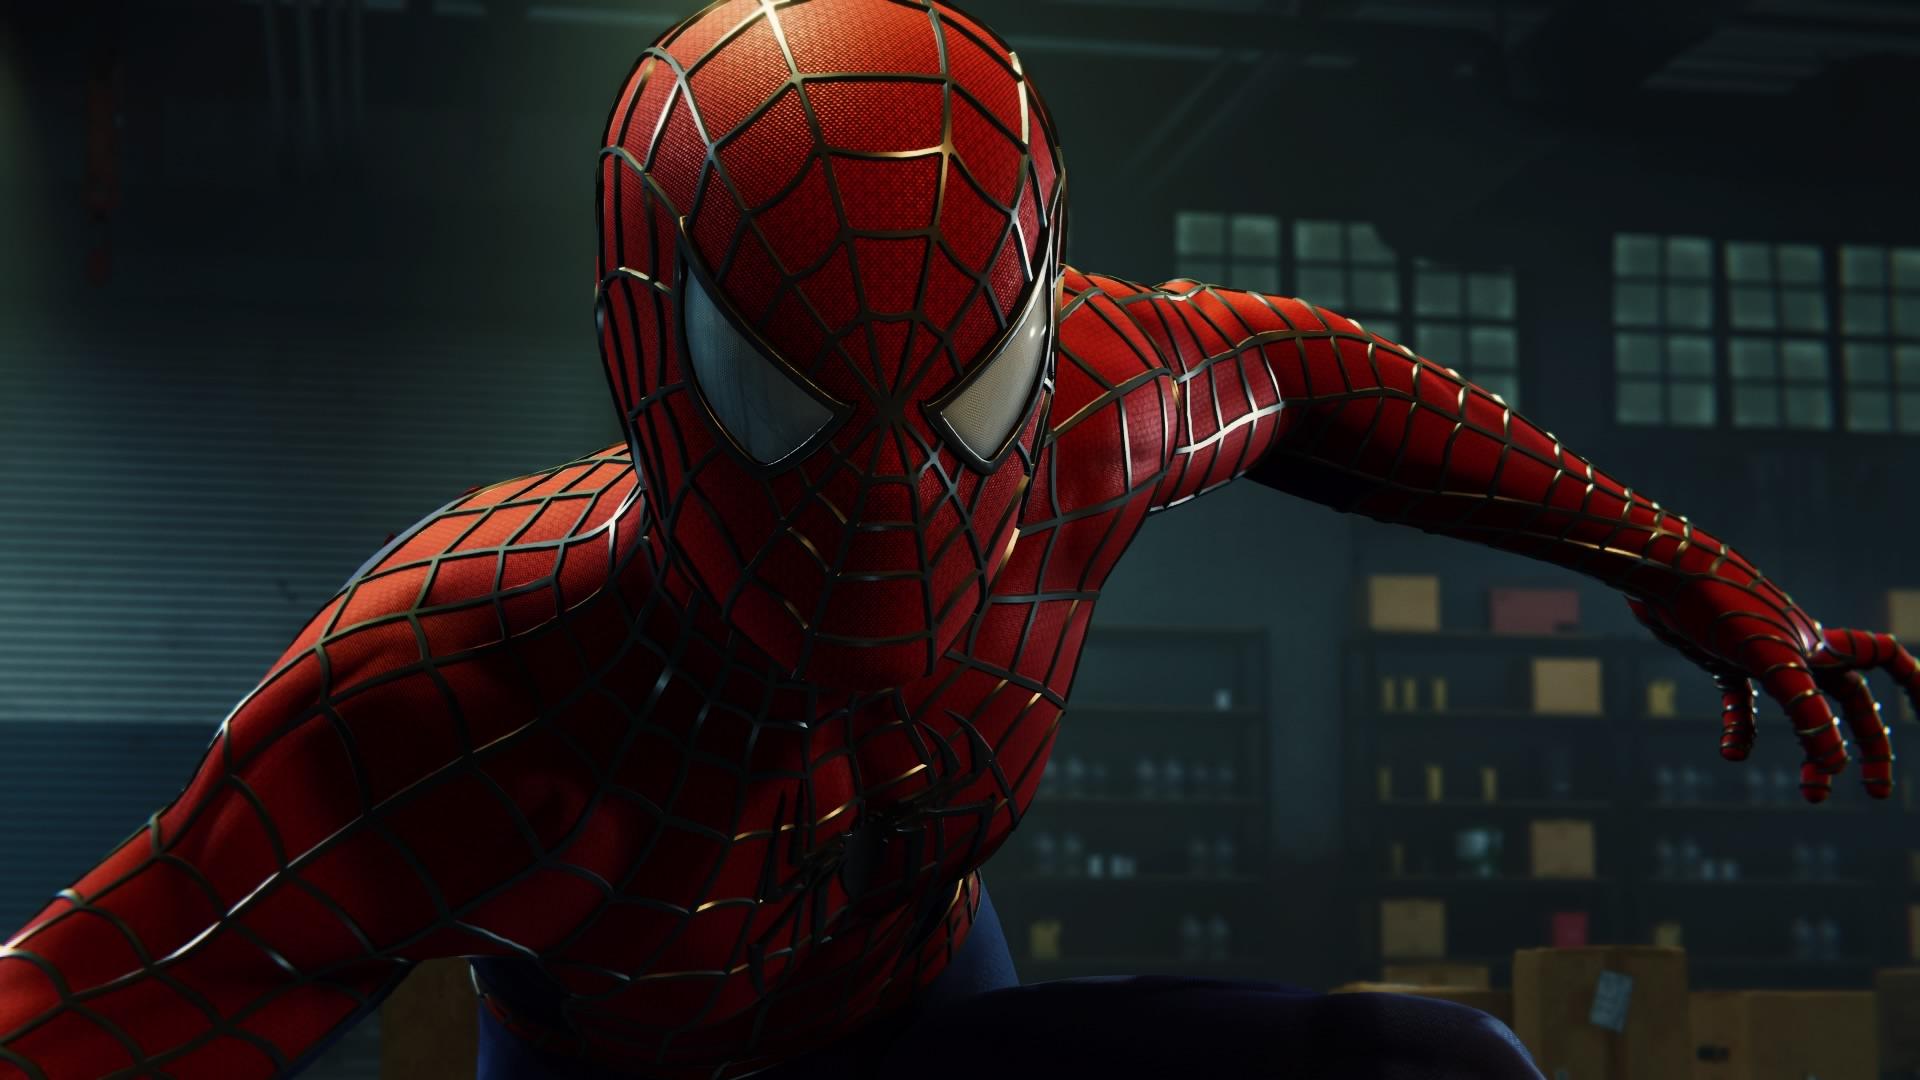 098d81d0-92b7-11e9-9c1d-0a7d186609b8.jpg - Marvel's Spider-Man